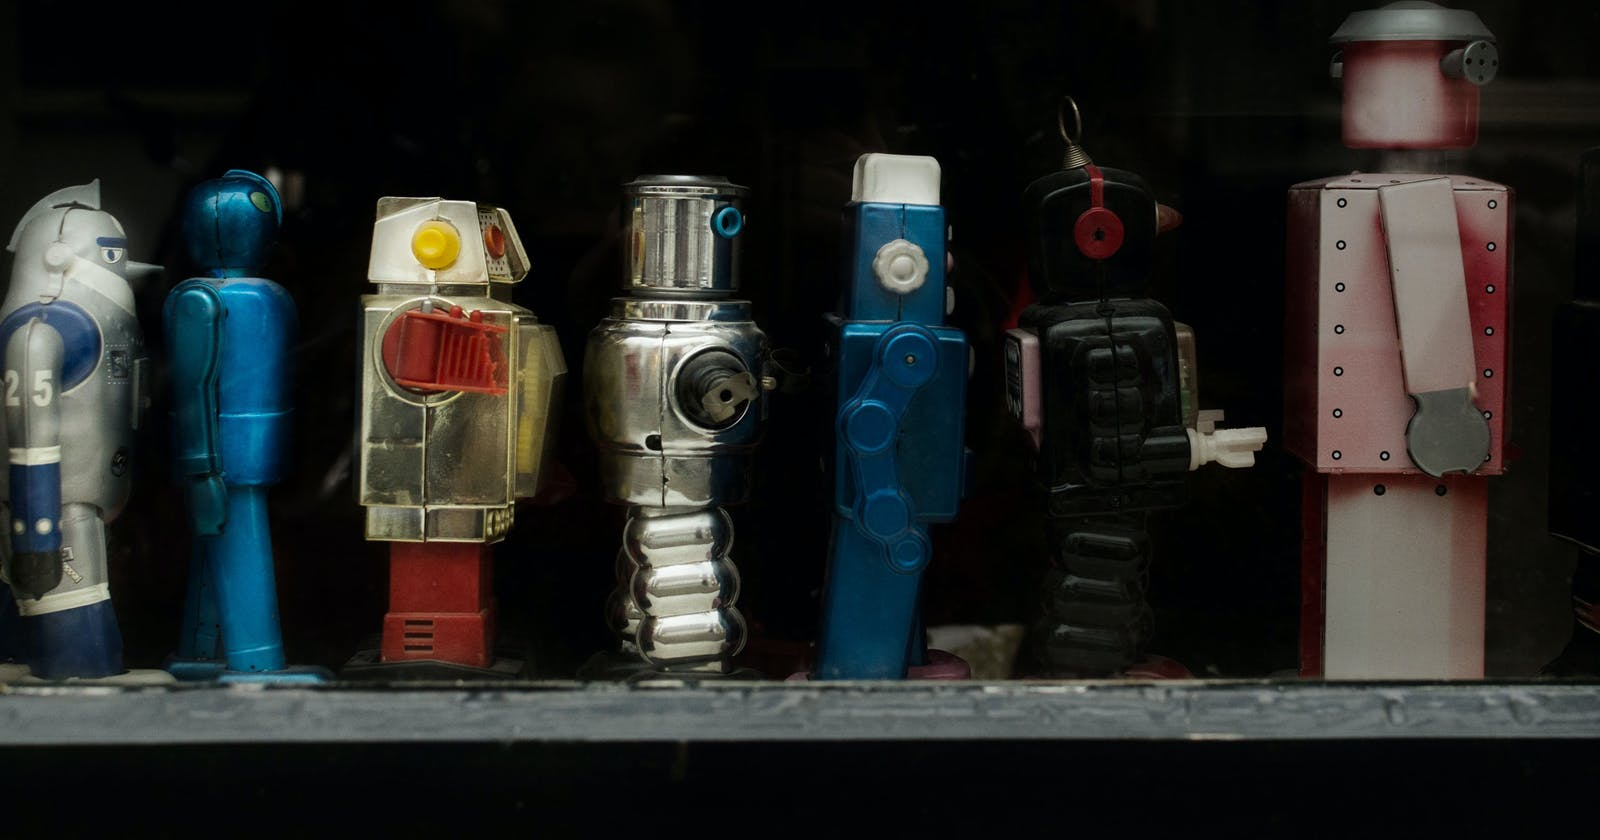 UiPath Robots: An Overview